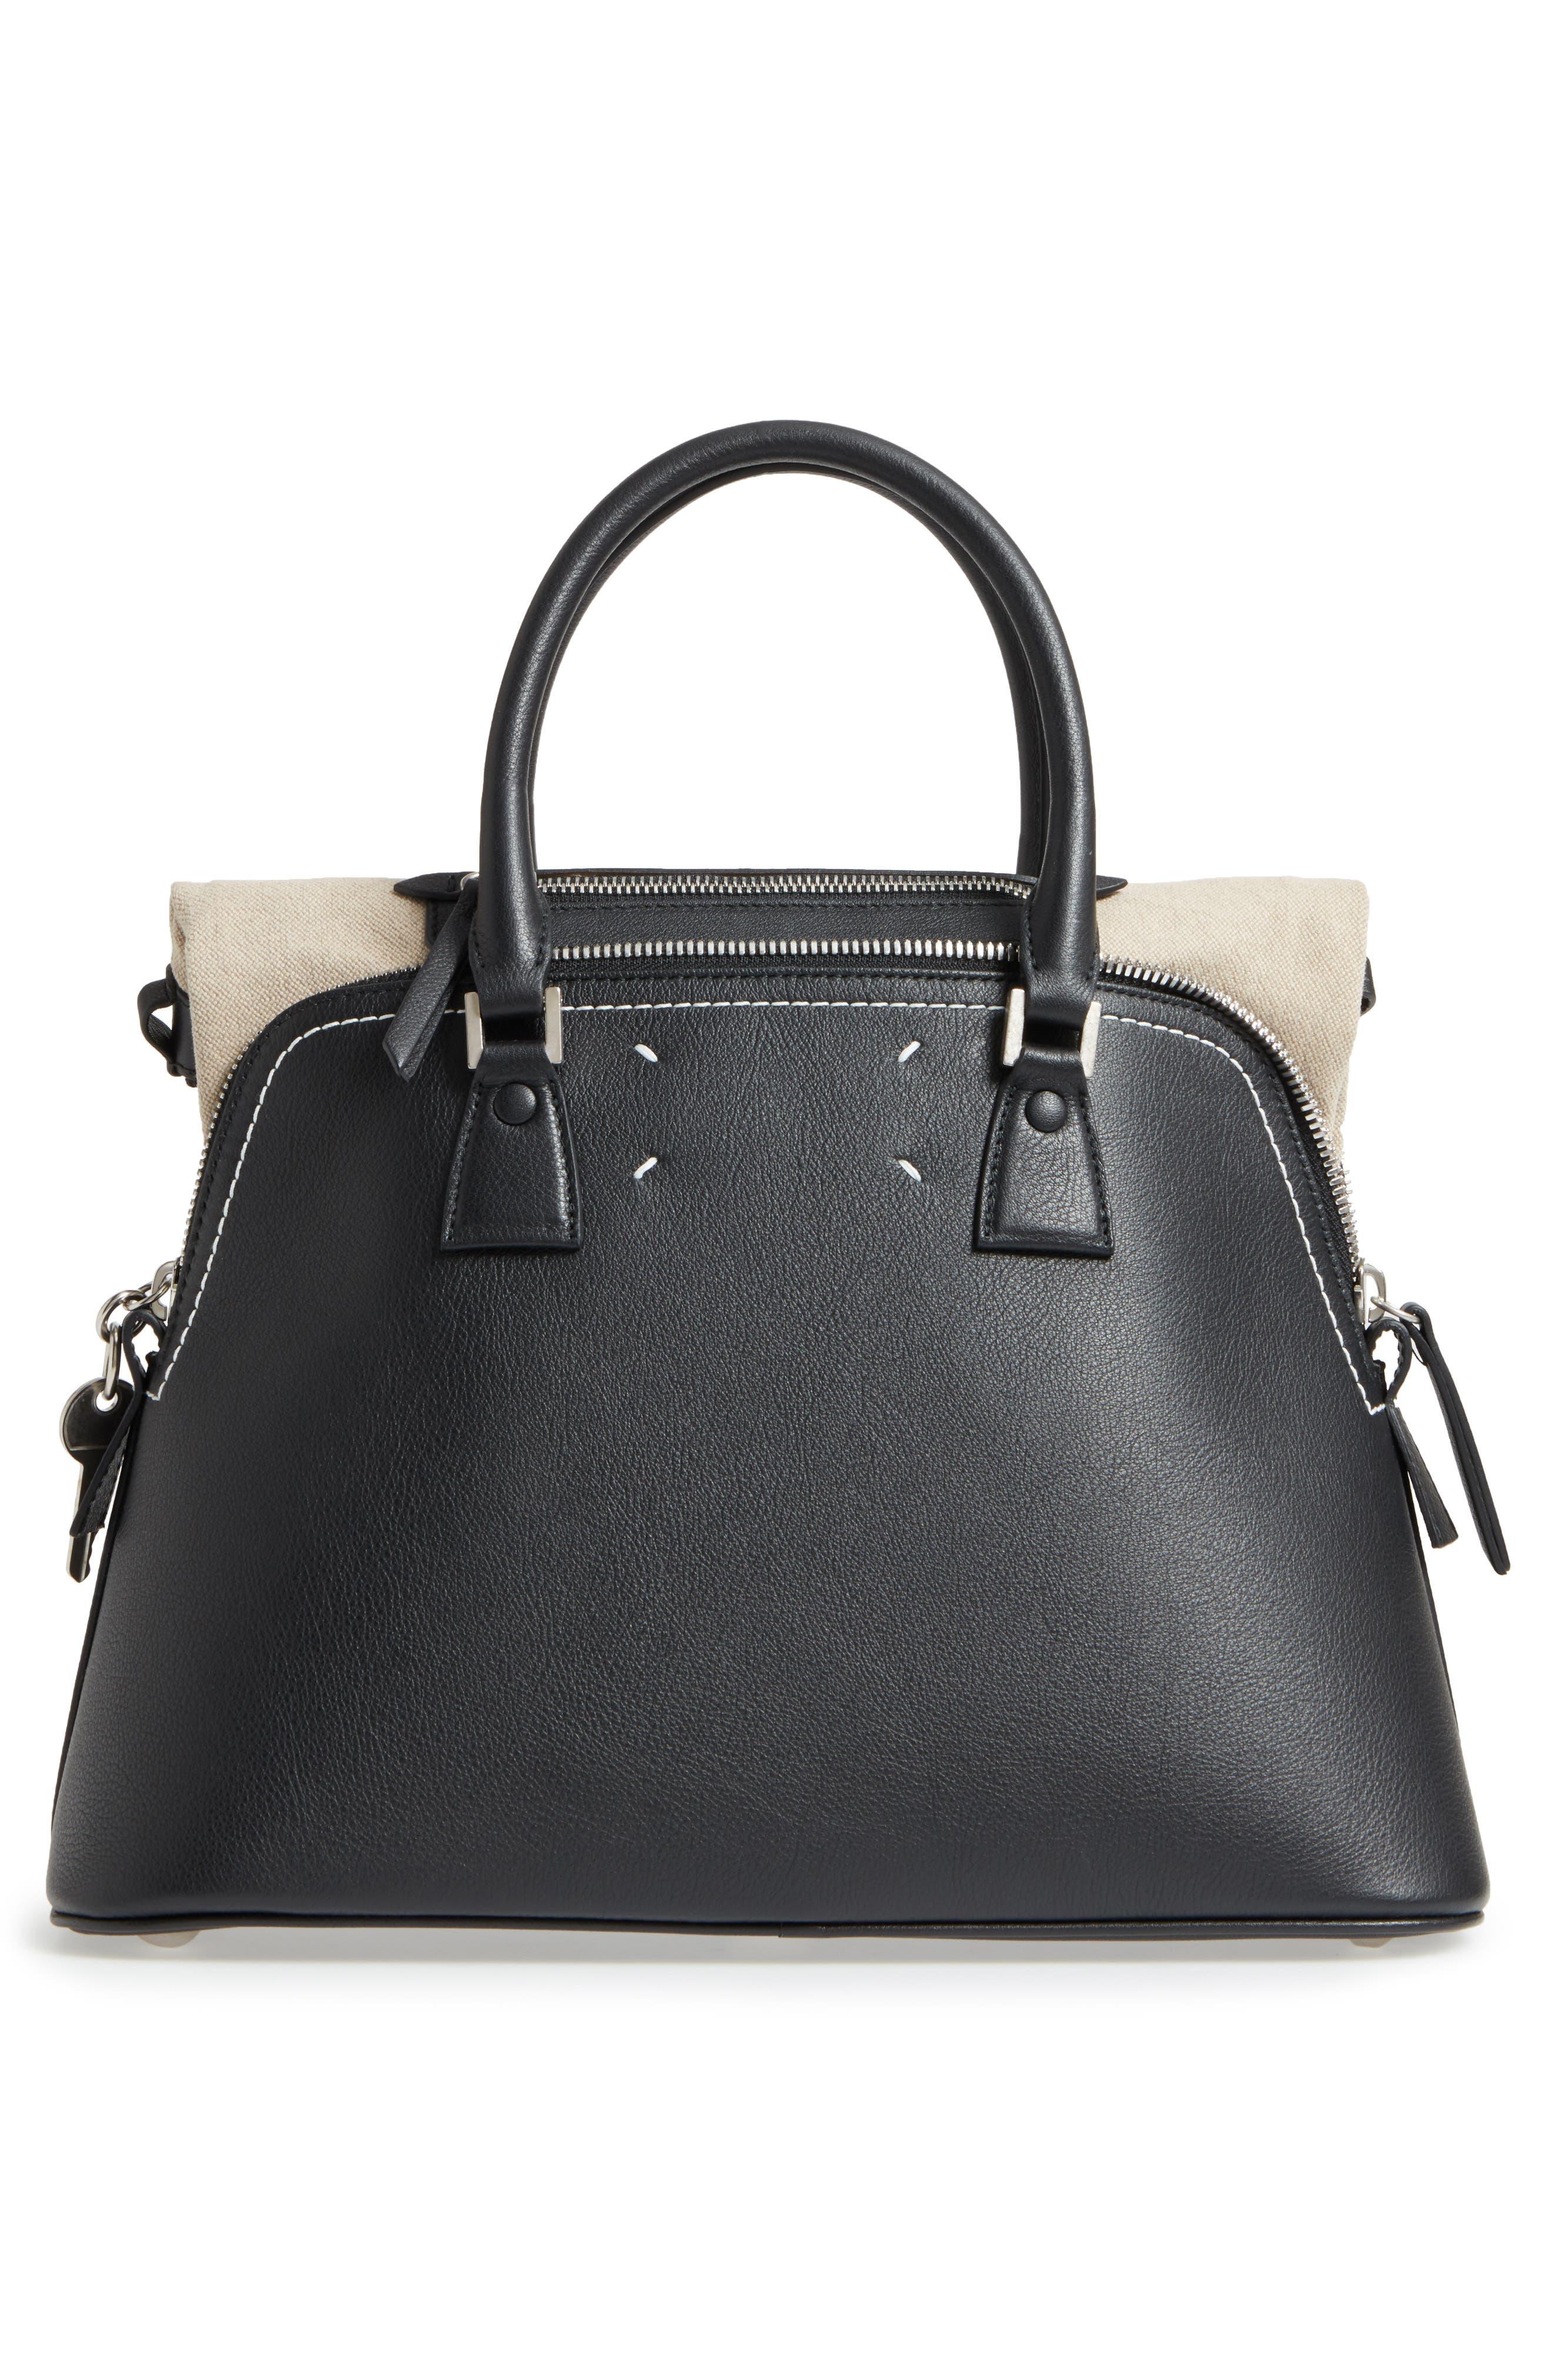 Medium 5AC Leather Handbag,                             Alternate thumbnail 3, color,                             Black